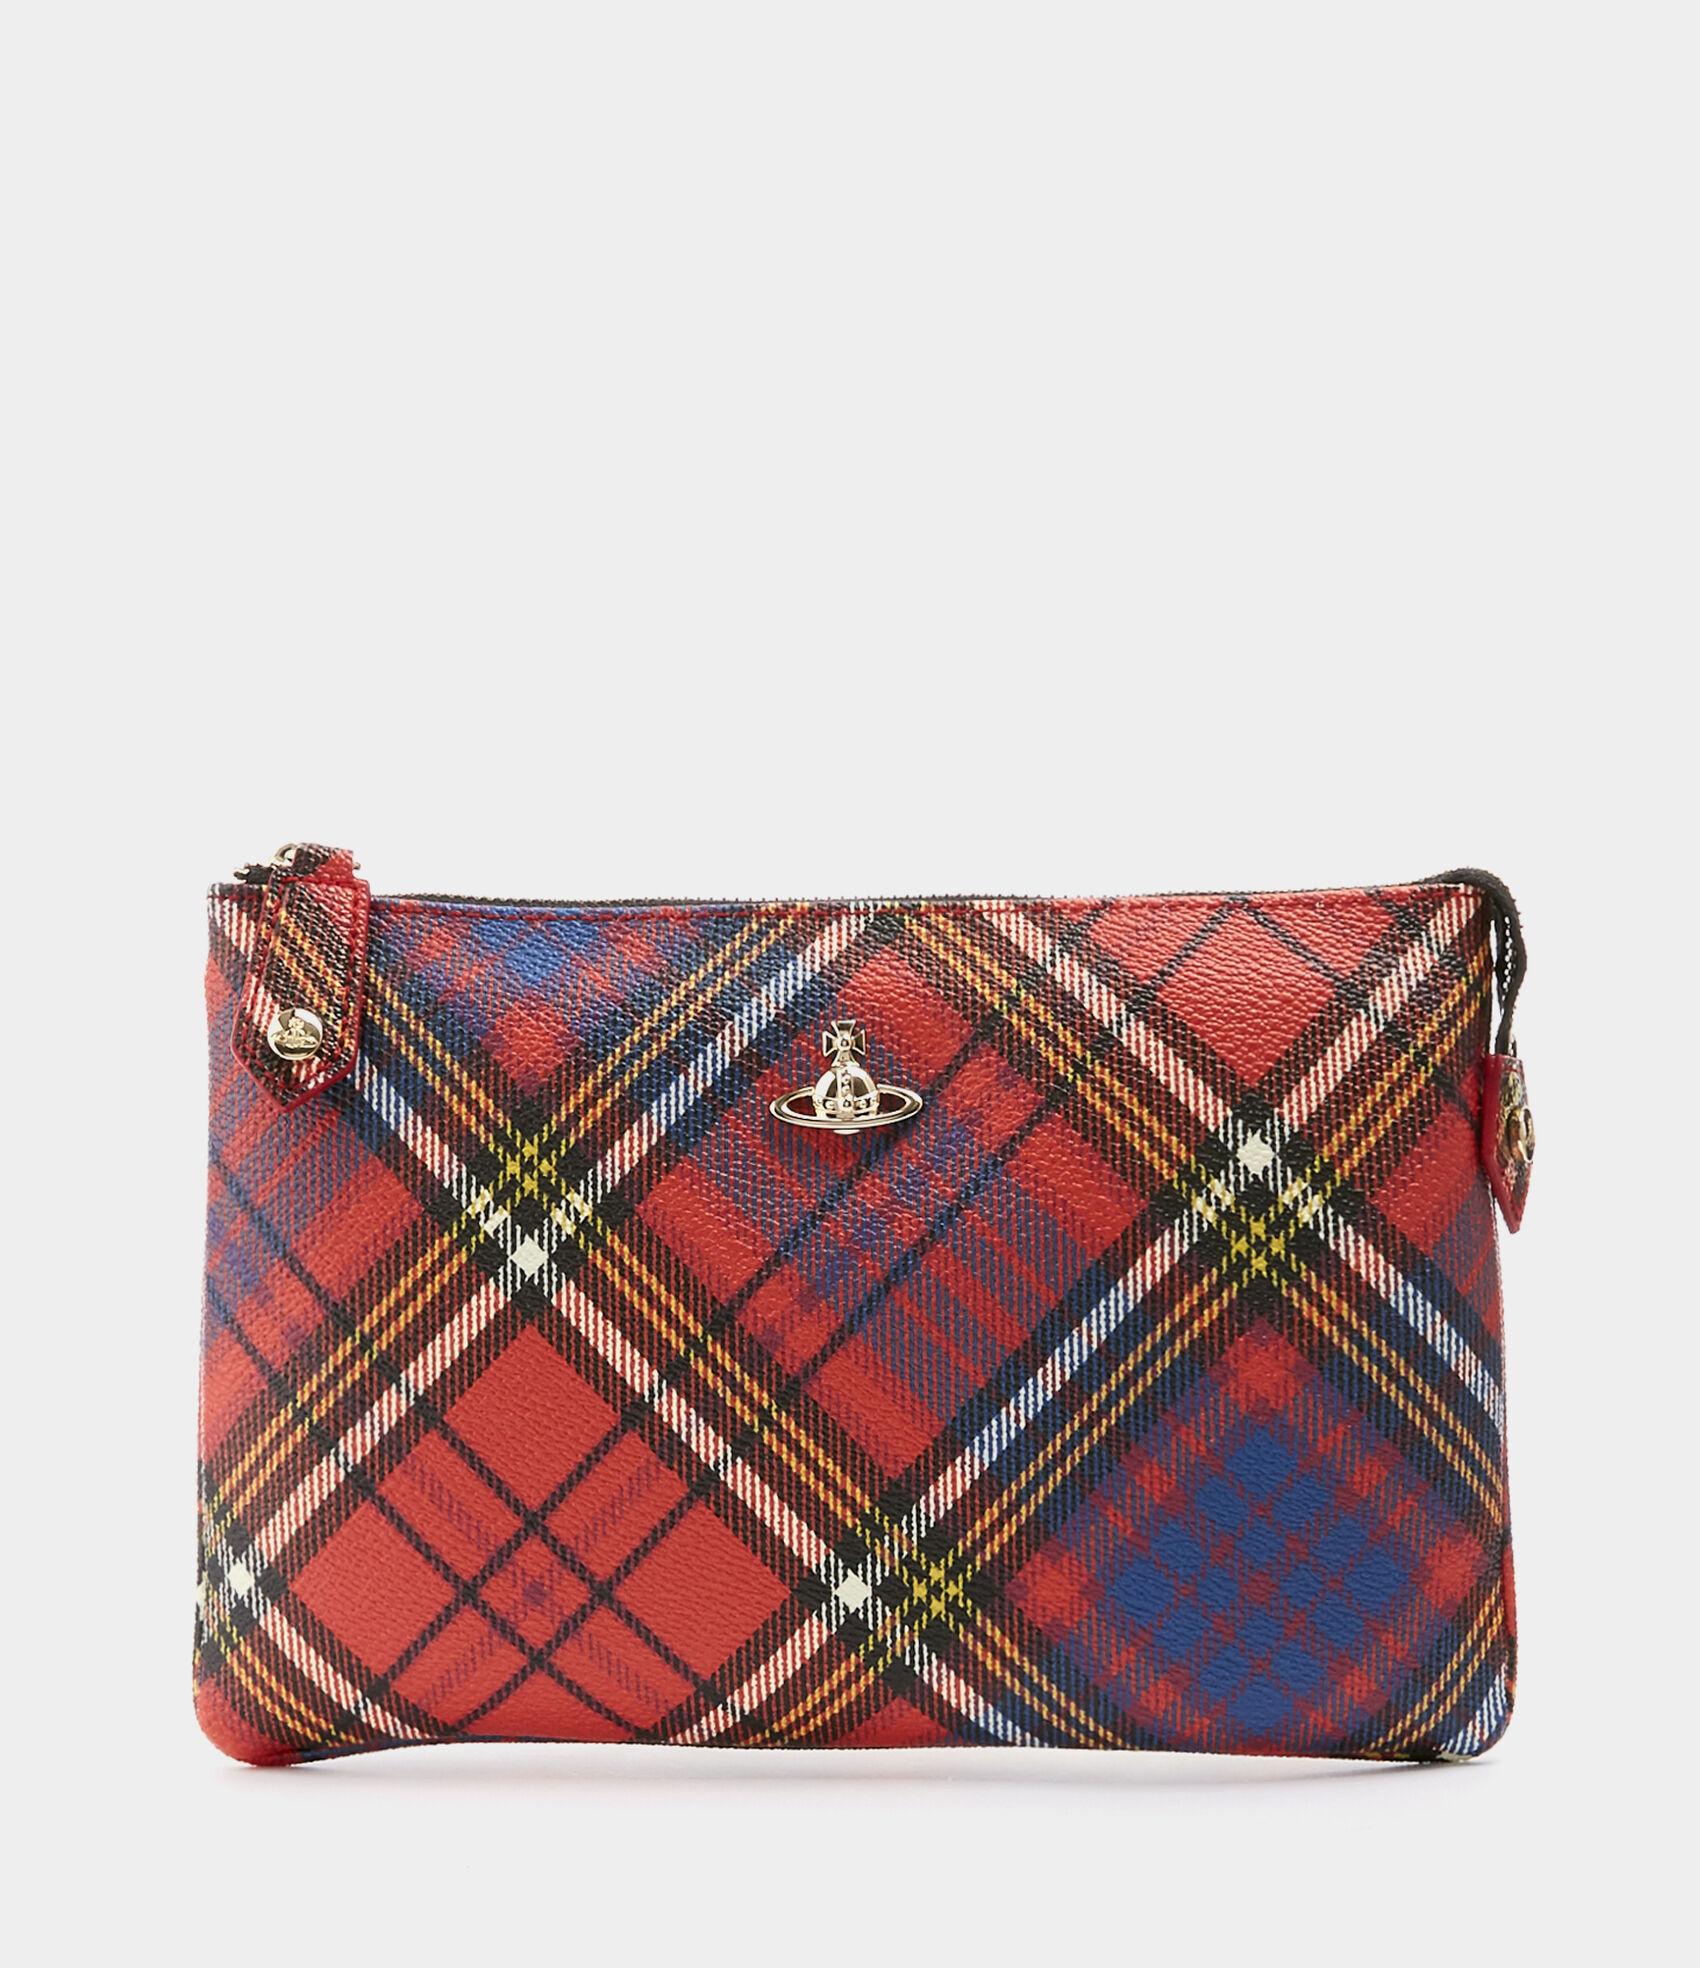 7b21a2df2c4 Derby Top Zip Purse Mc Andreas. Vivienne Westwood Handbags Women S Bags